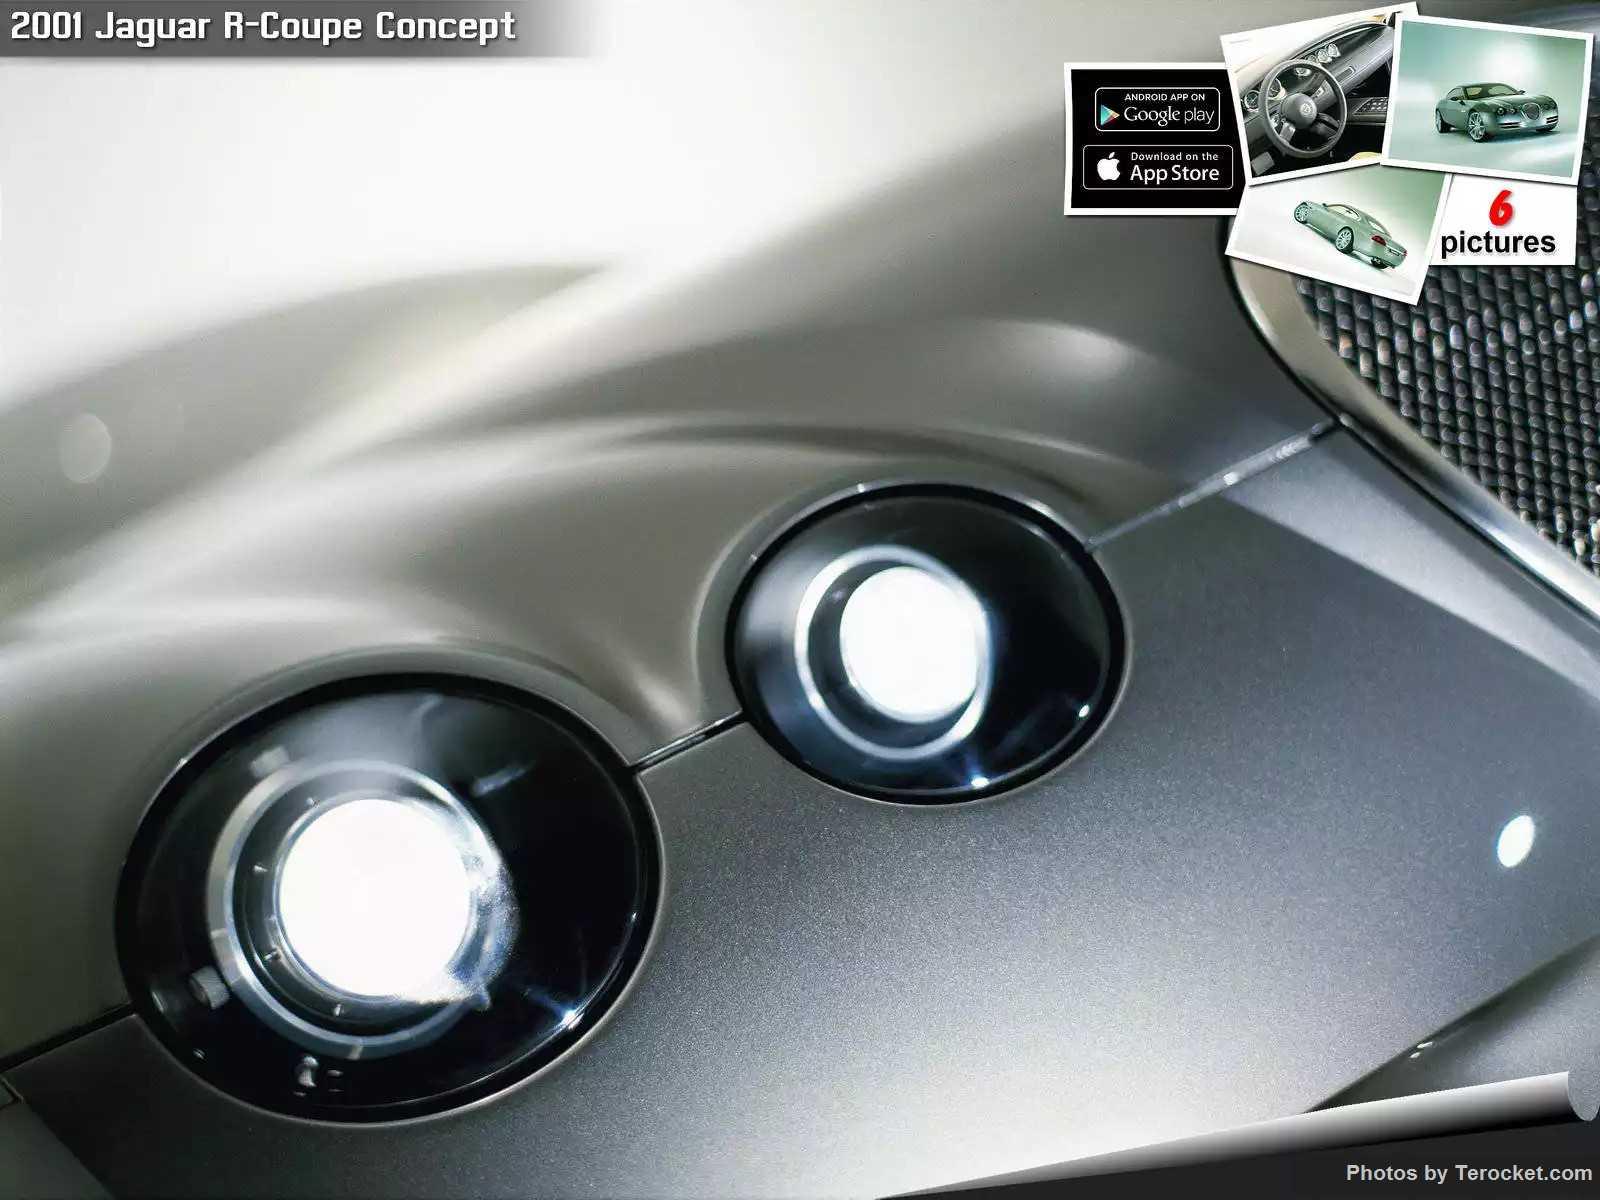 Hình ảnh xe ô tô Jaguar R-Coupe Concept 2001 & nội ngoại thất